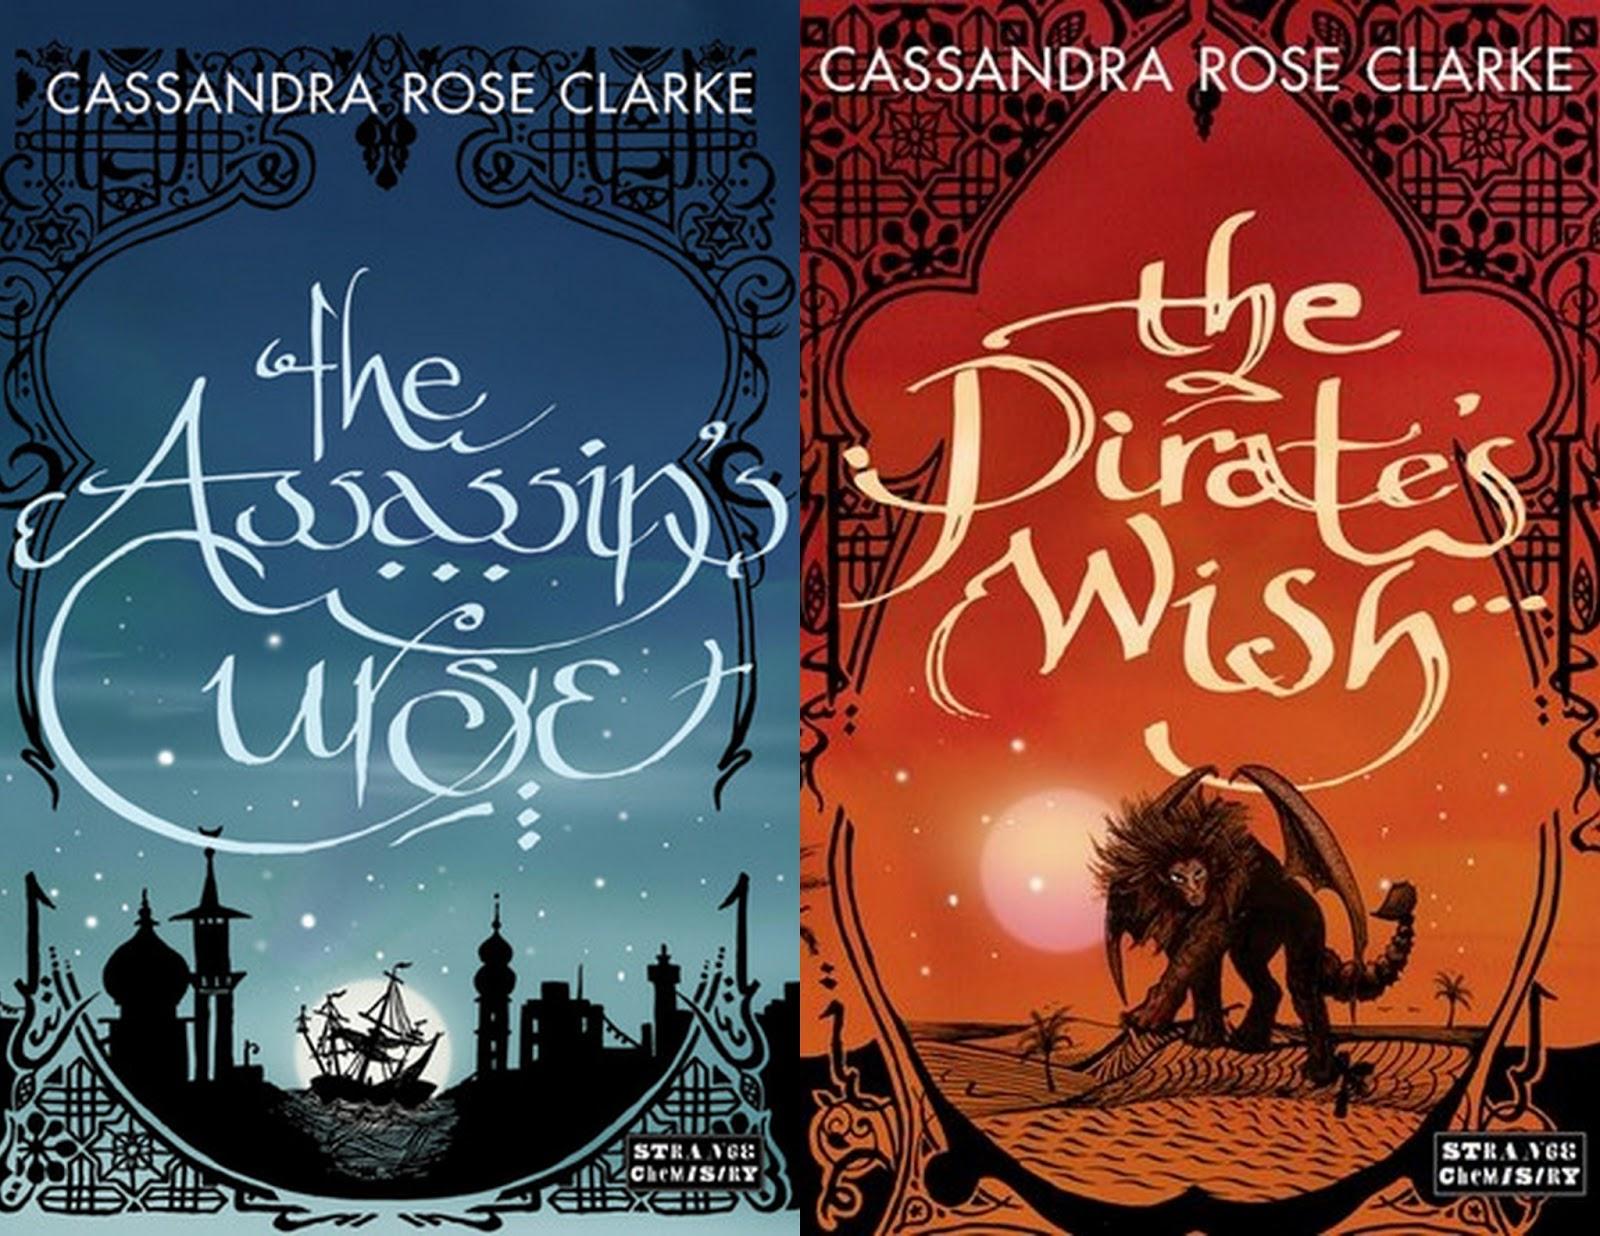 Amazon  Barnes & Noble  Goodreads Title: The Pirate's Wish Author: Cassandra  Rose Clark